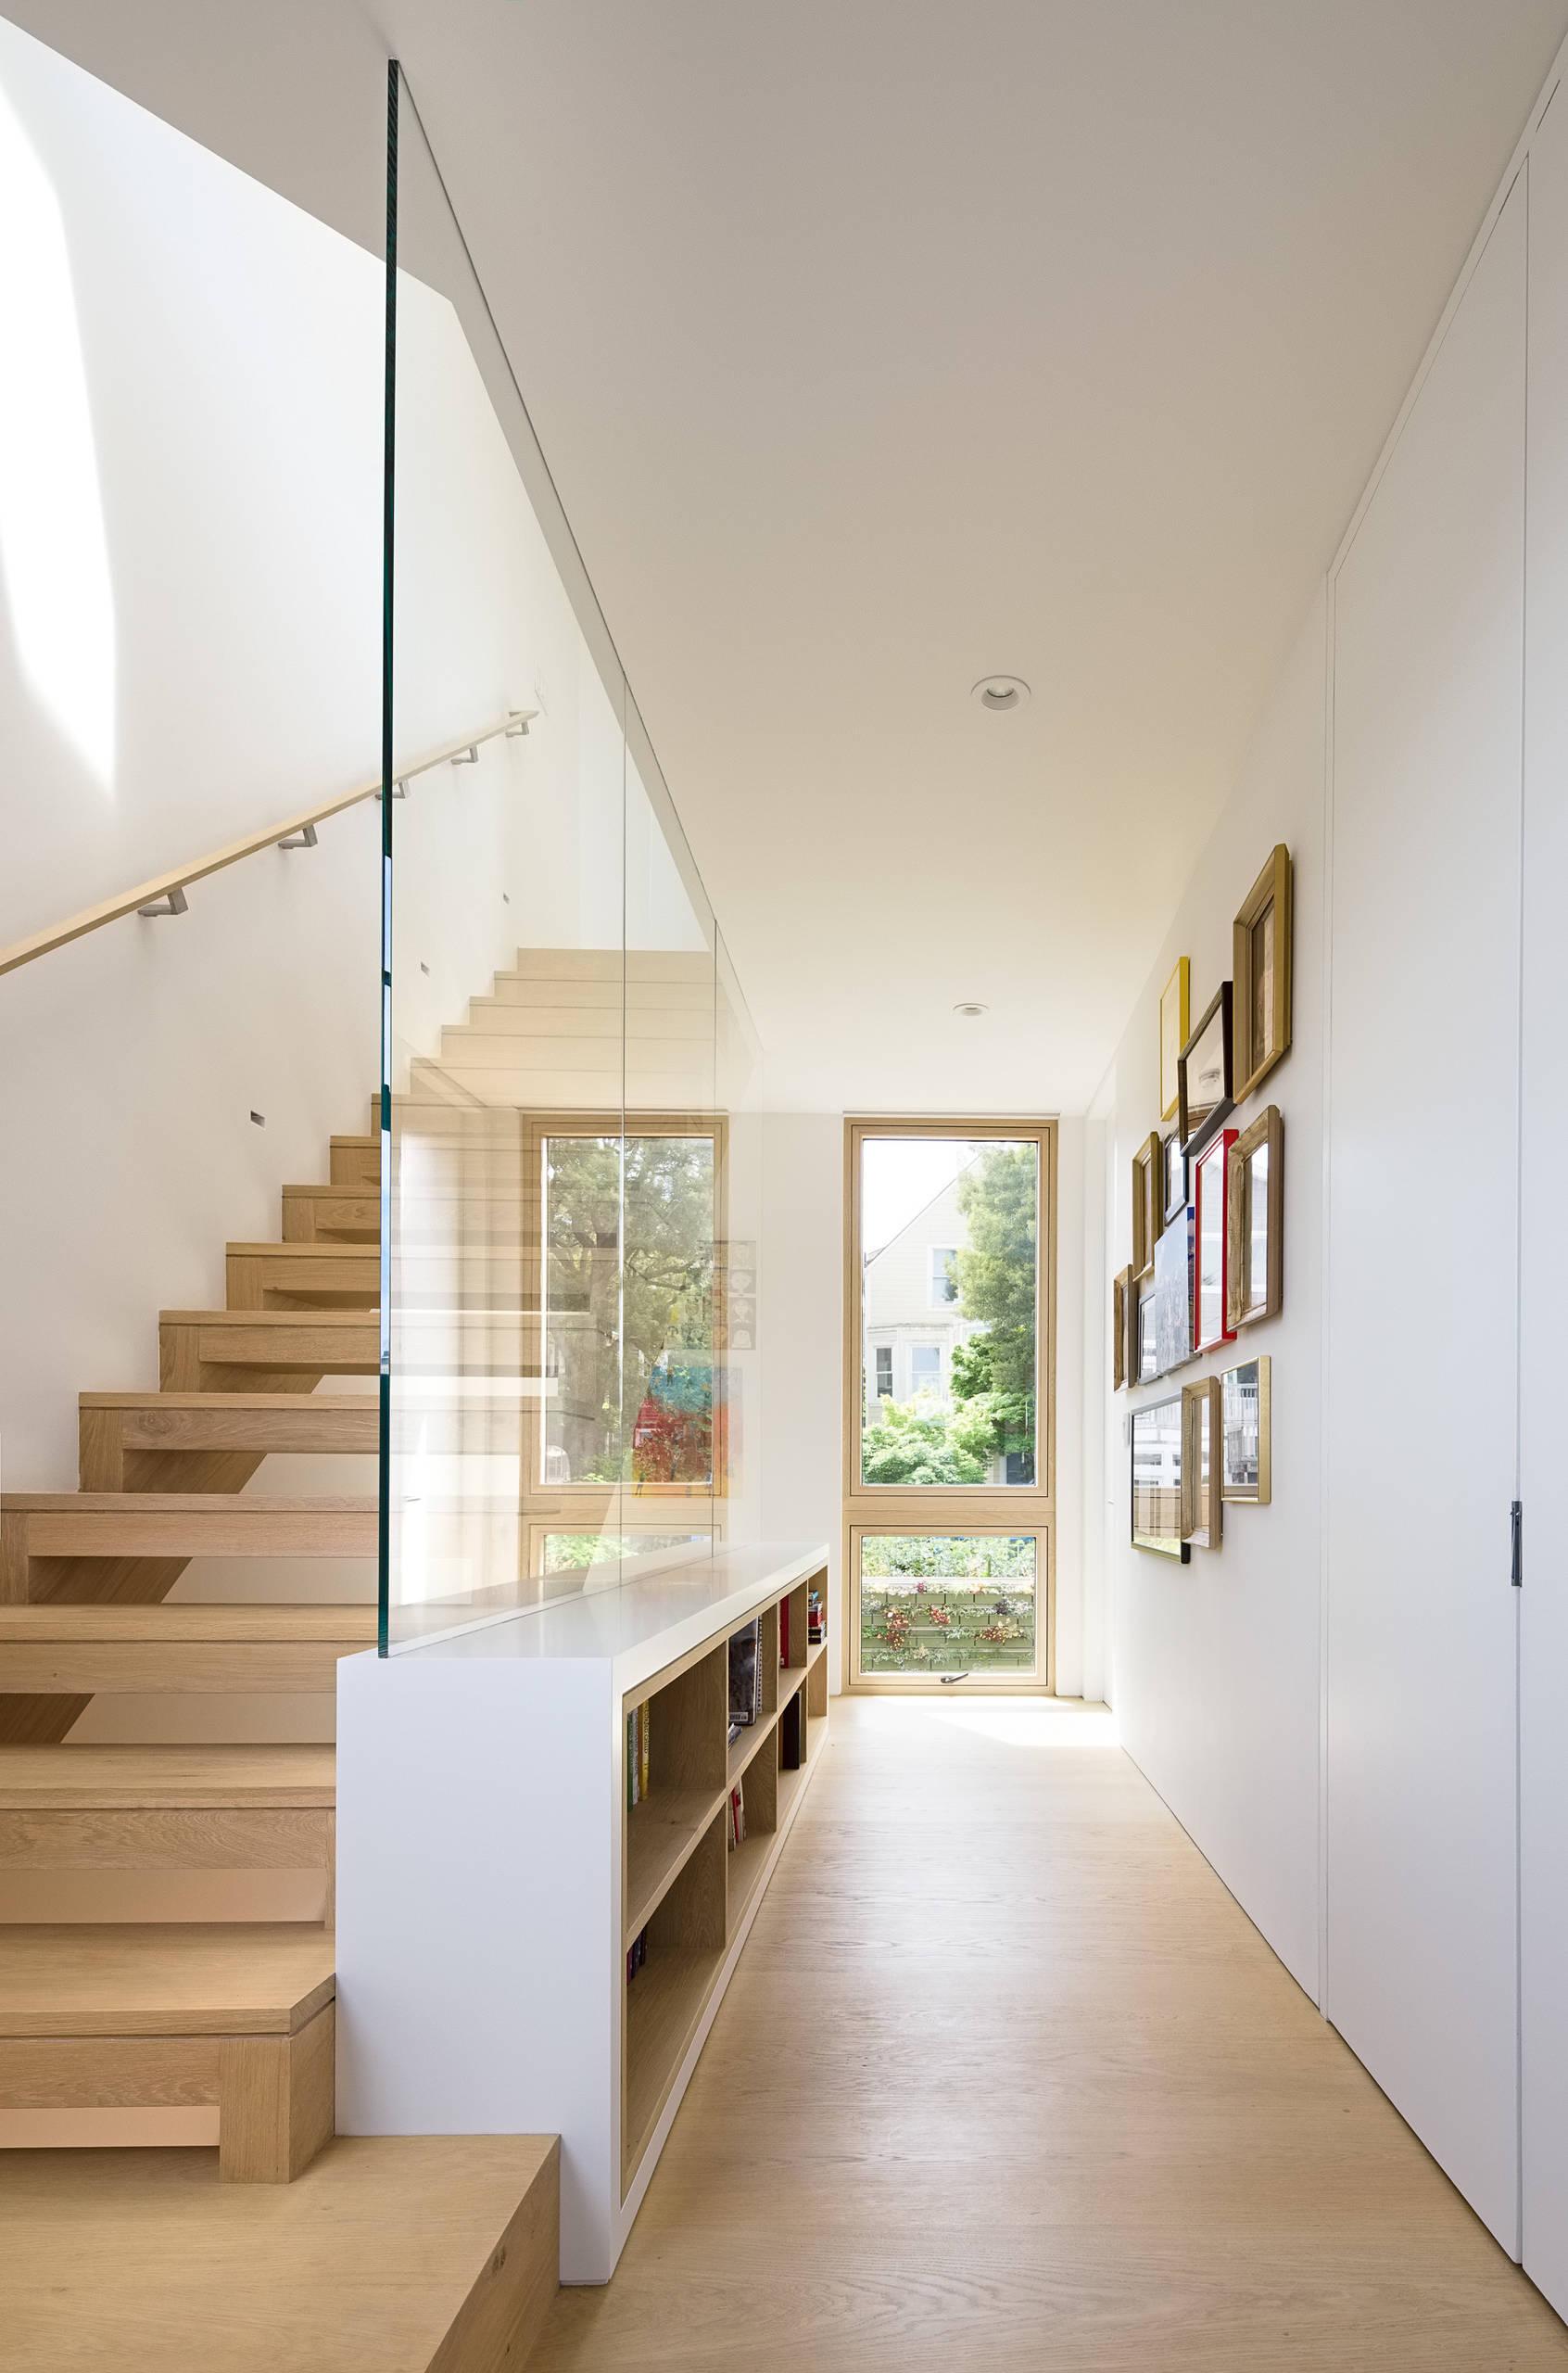 75 Beautiful Modern Hallway Pictures Ideas November 2020 Houzz